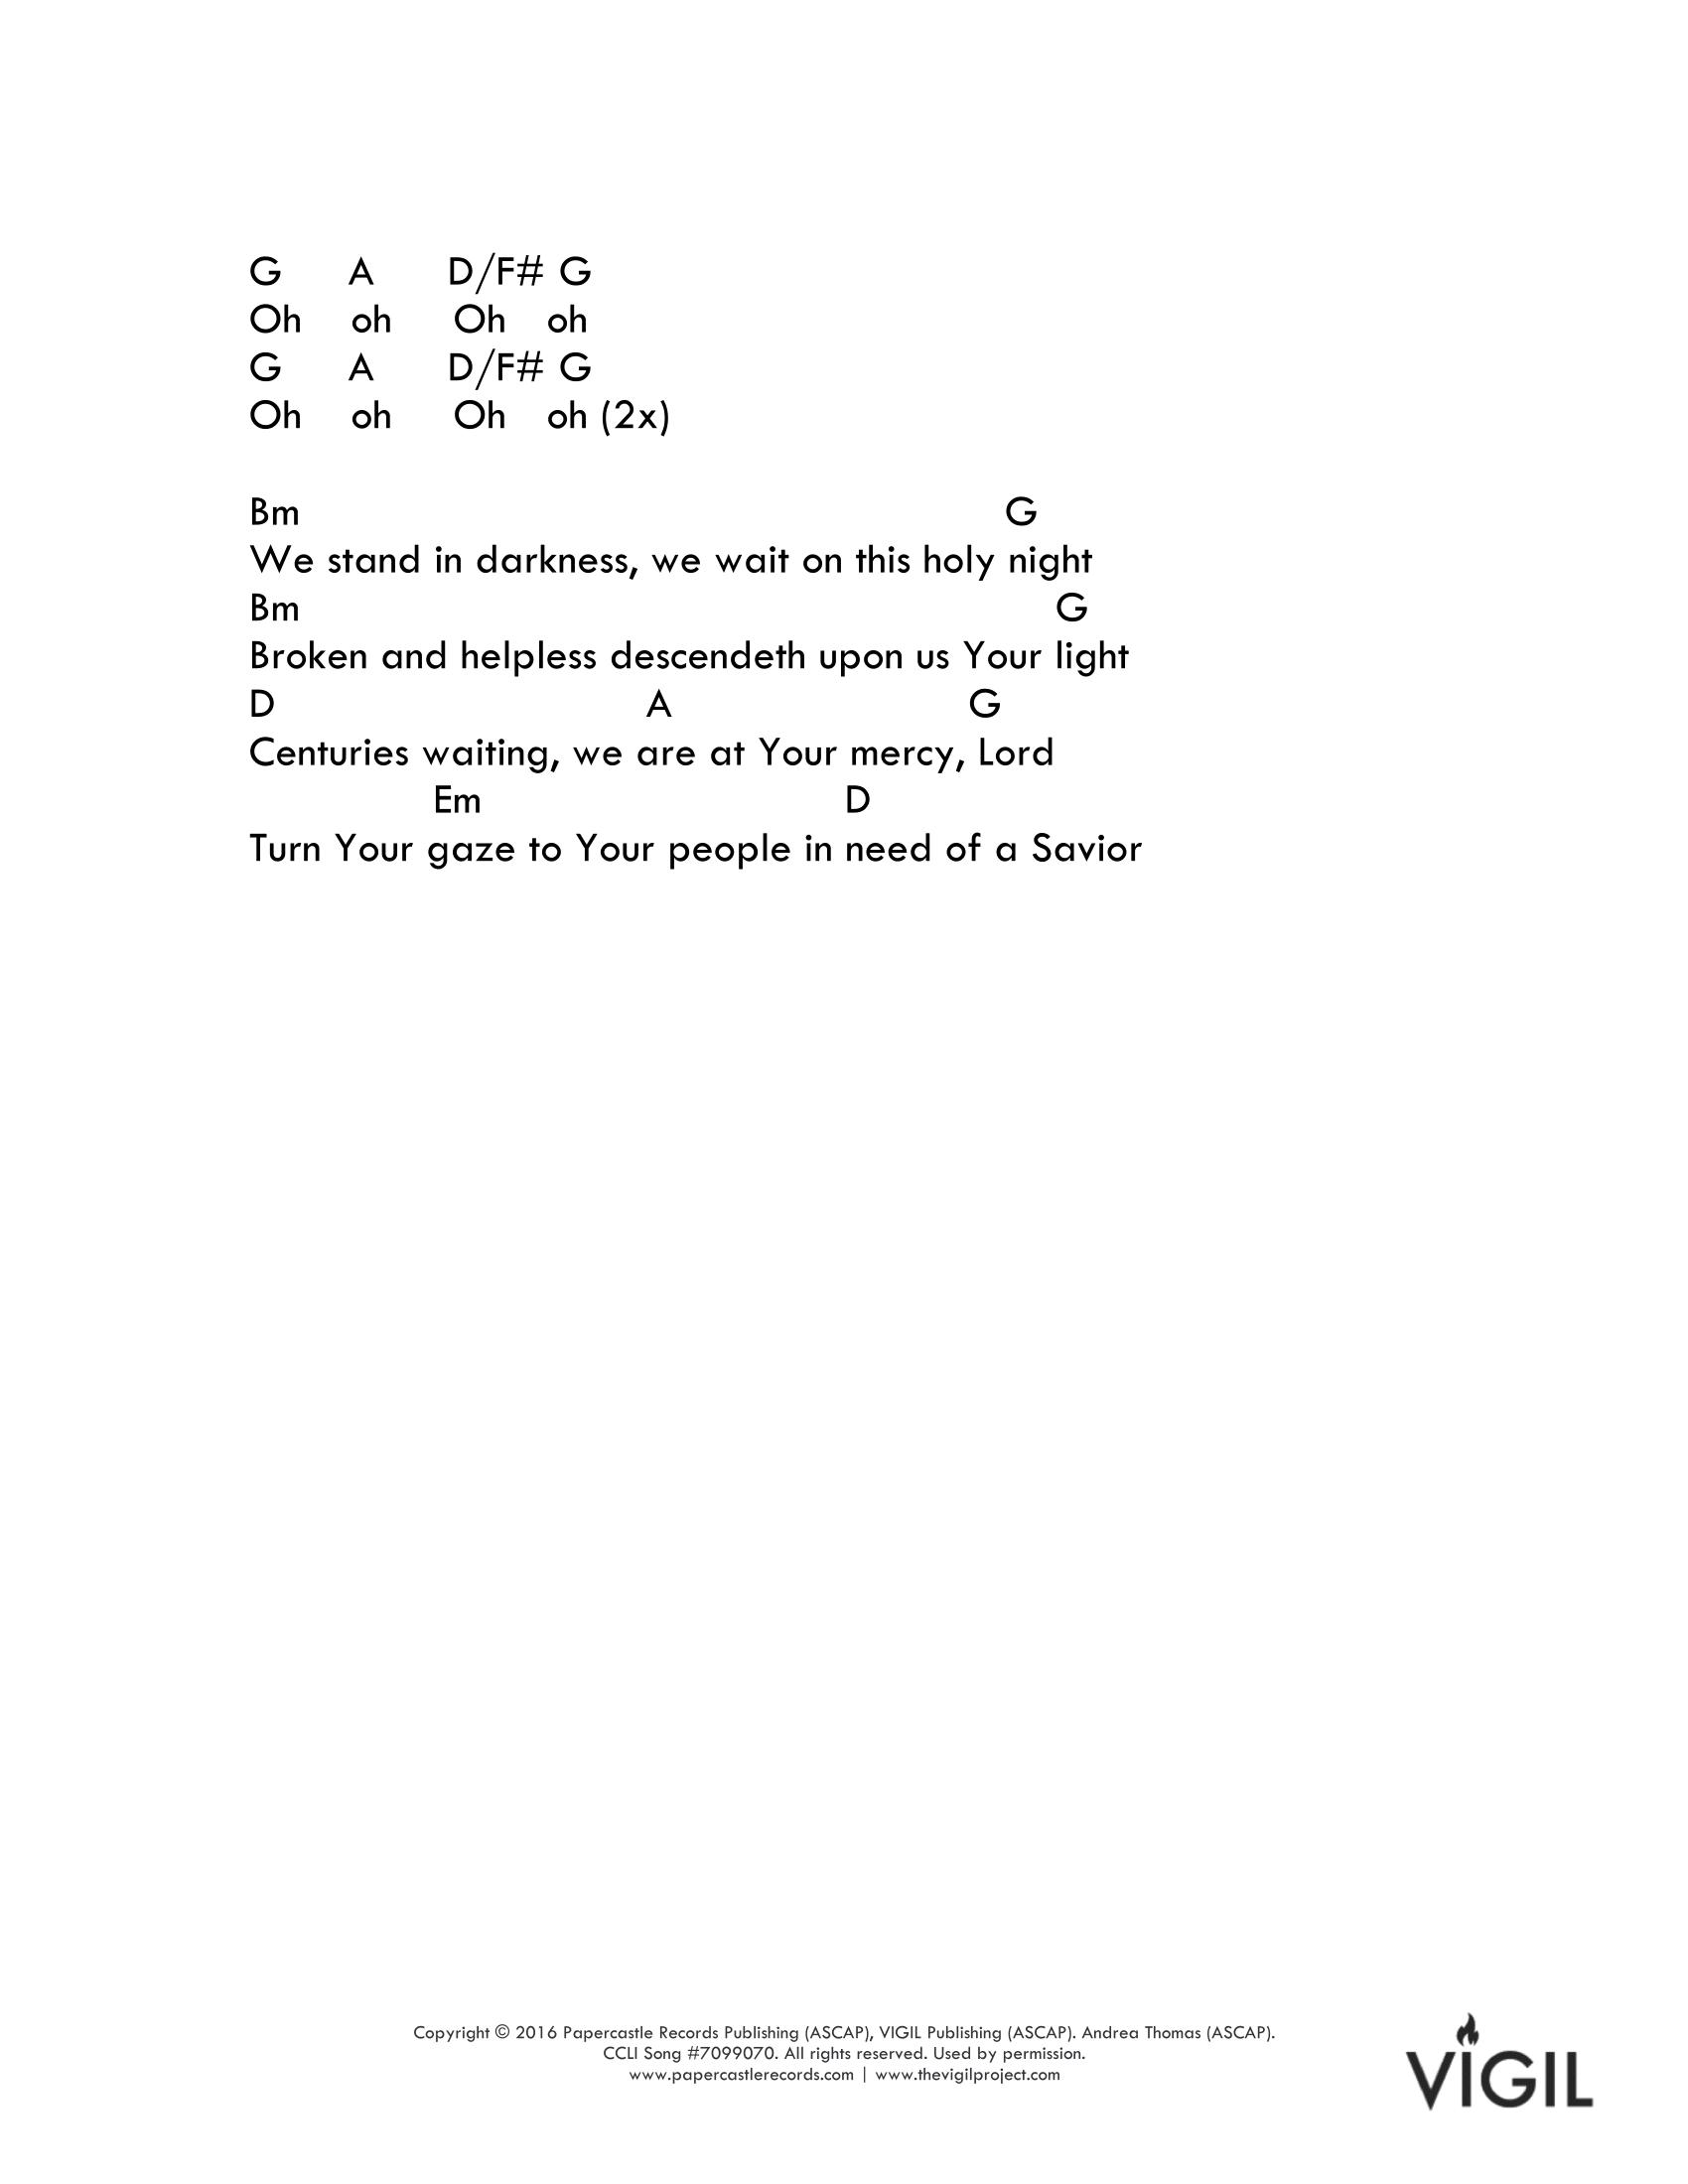 VIGIL S2 - In Need of a Savior (D Major)-2.png